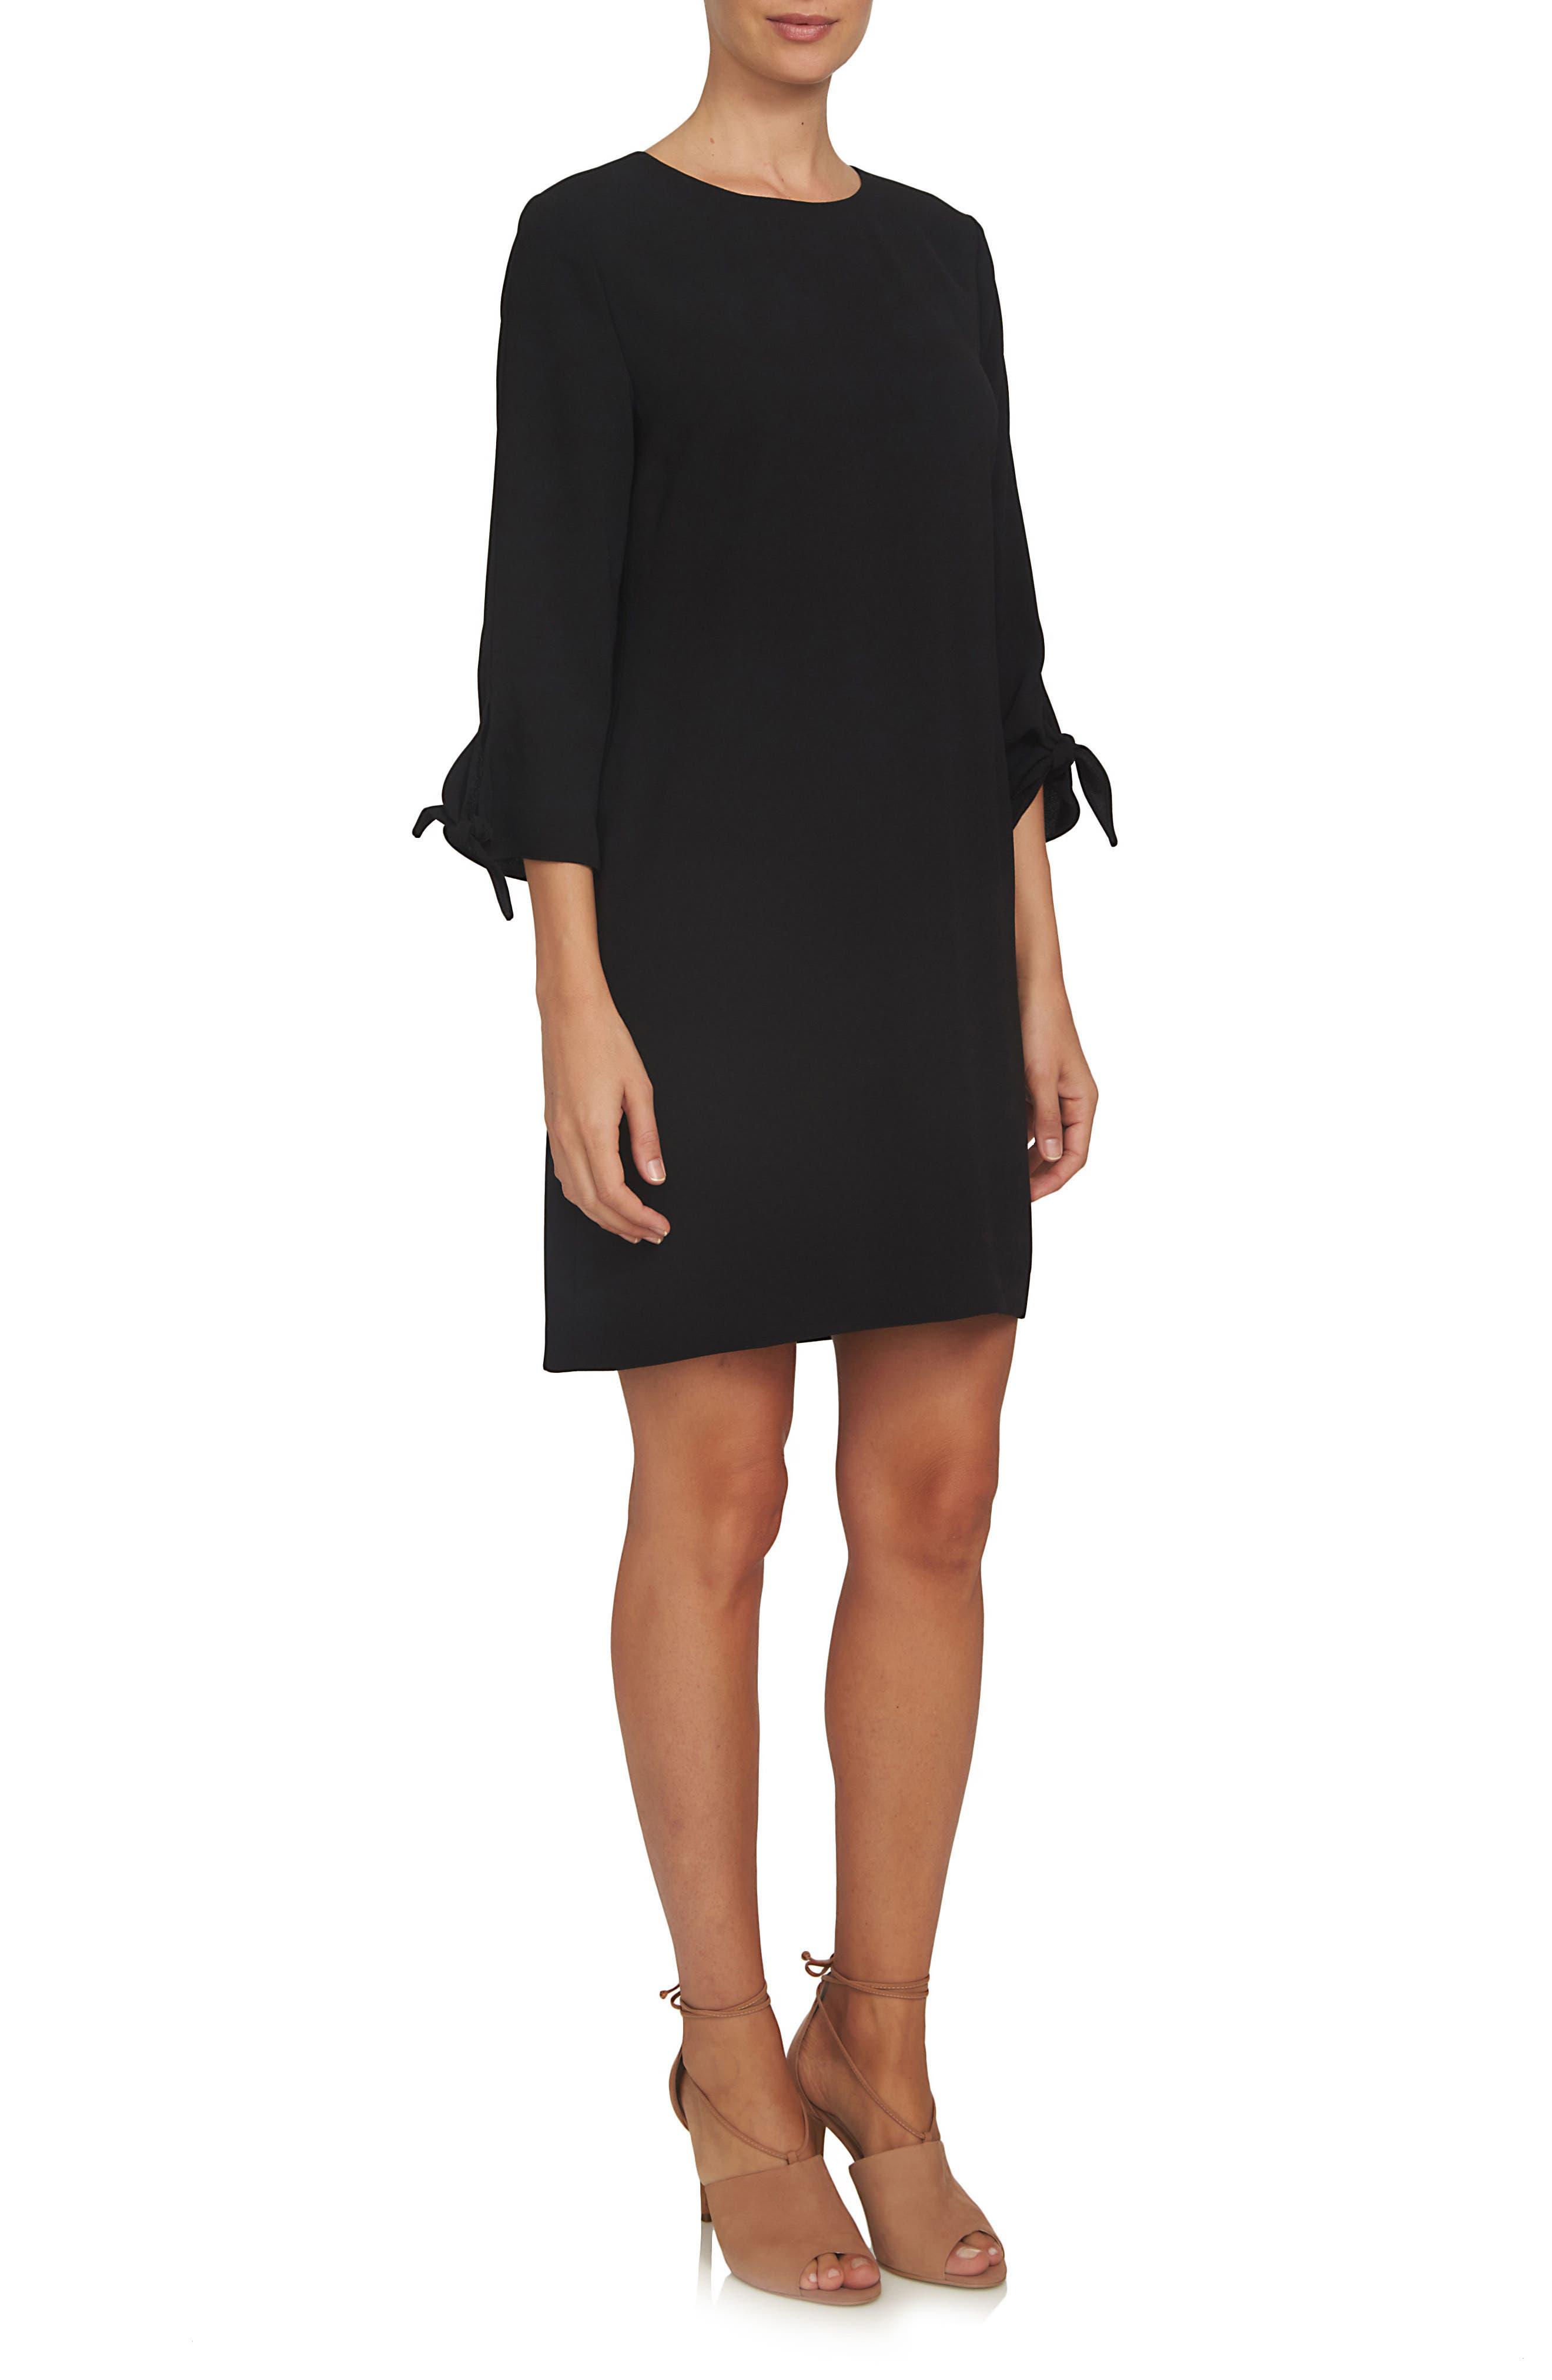 d6c8942f58e Women s 3 4 Sleeve Dresses